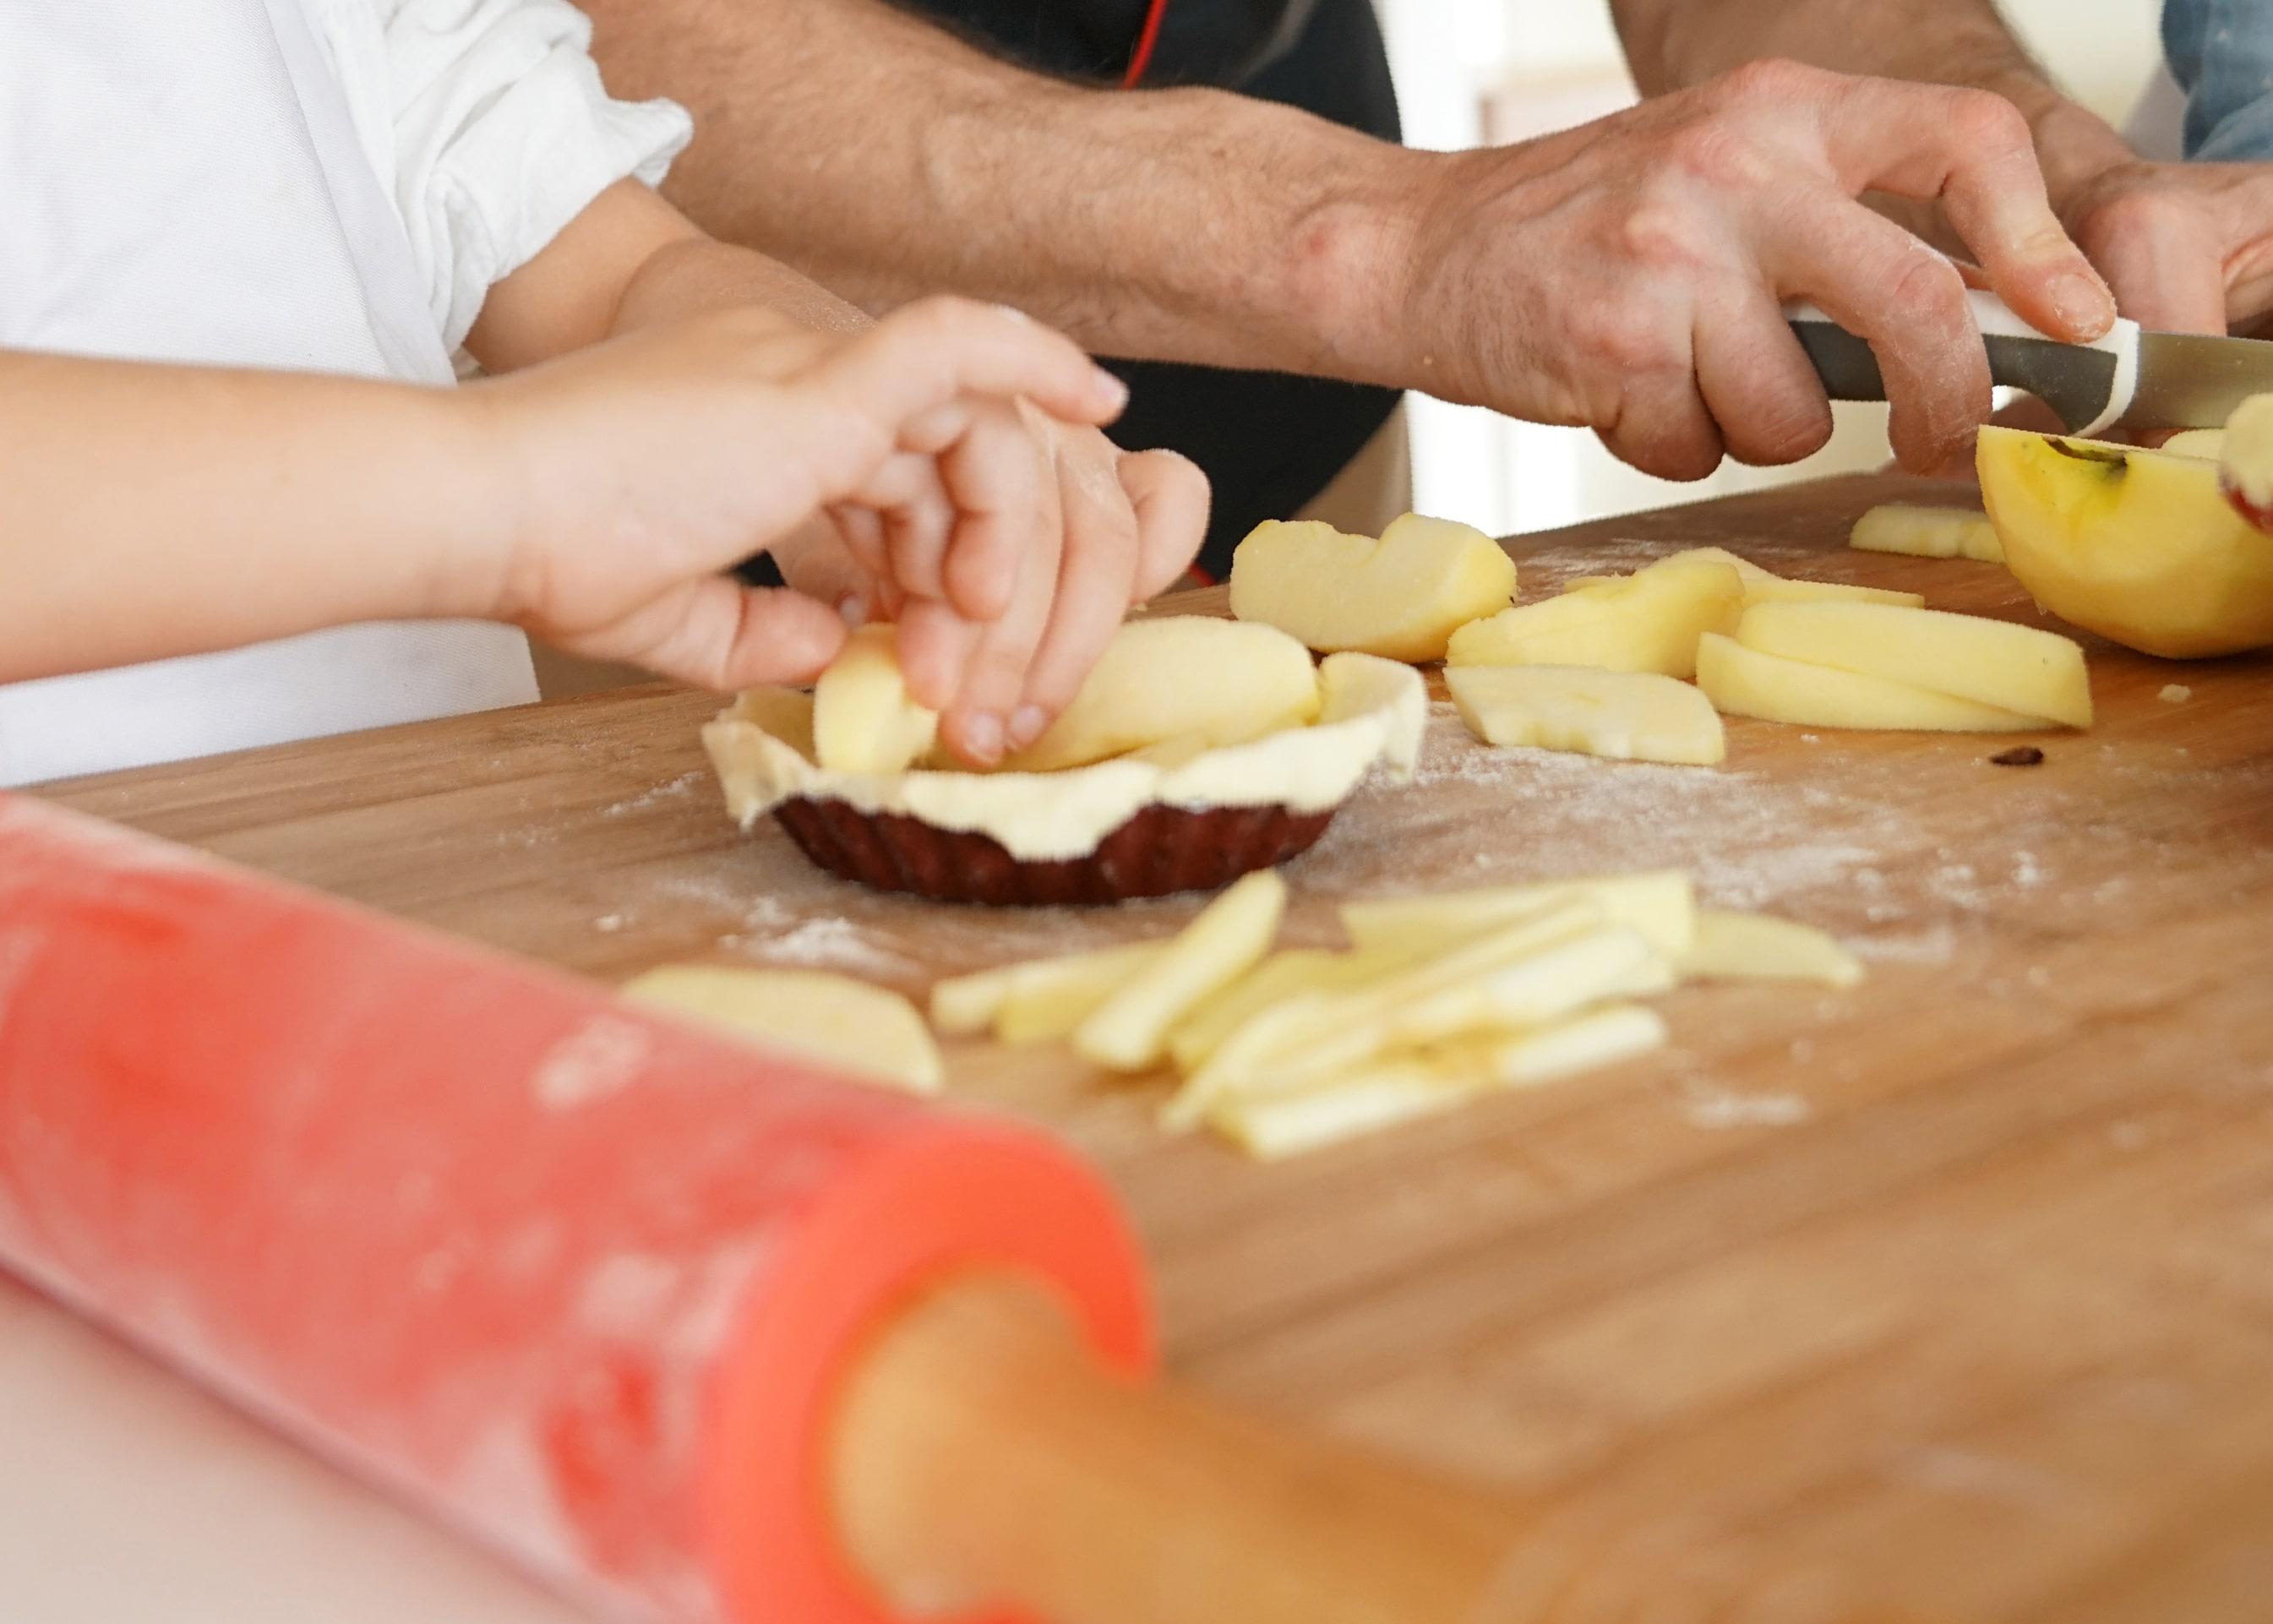 Homeschooling Days - Pie Baking